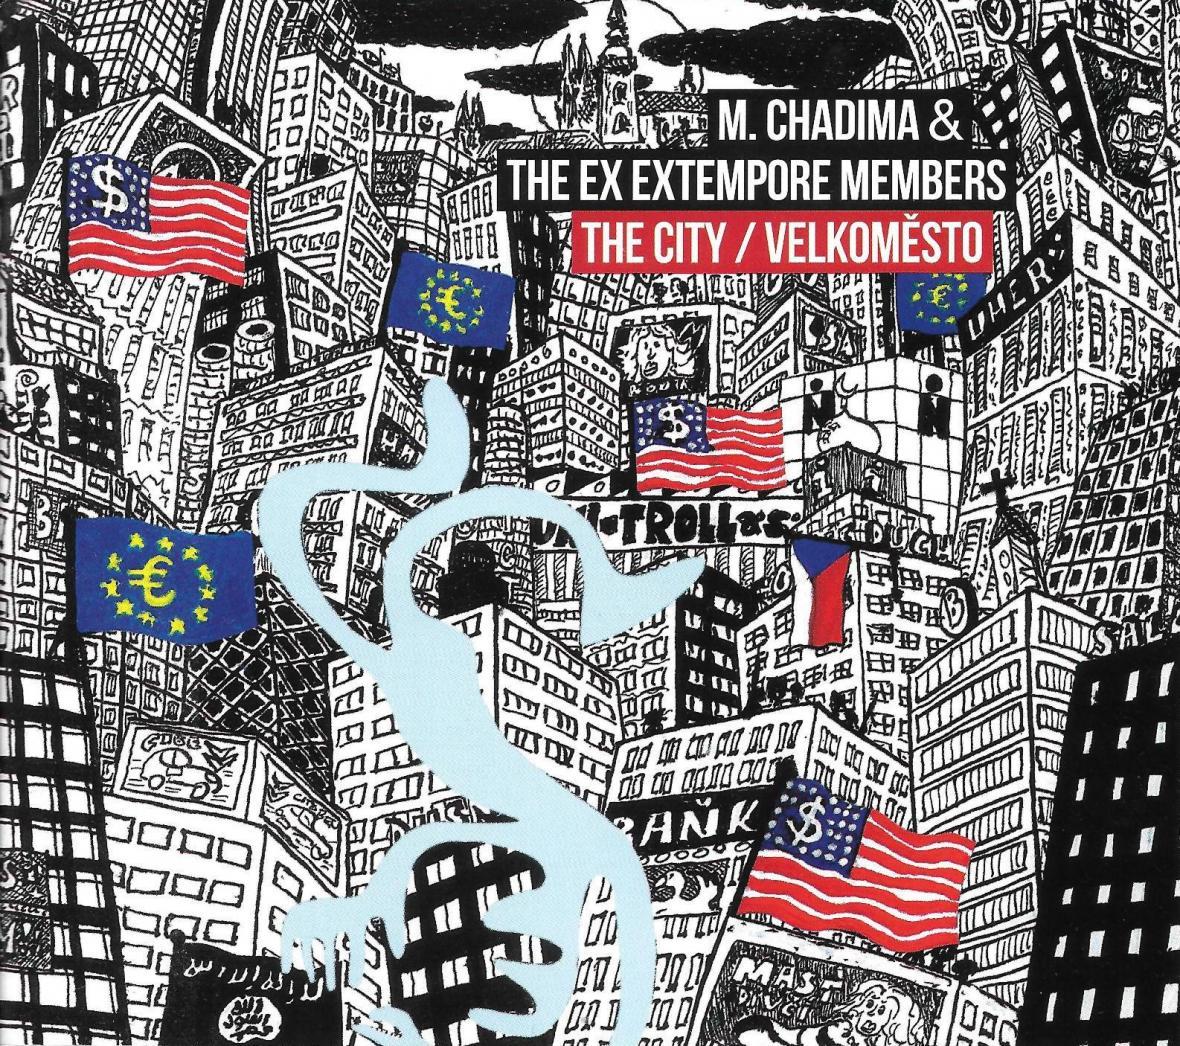 Mikoláš Chadima & The Ex Extempore Members / Velkoměsto